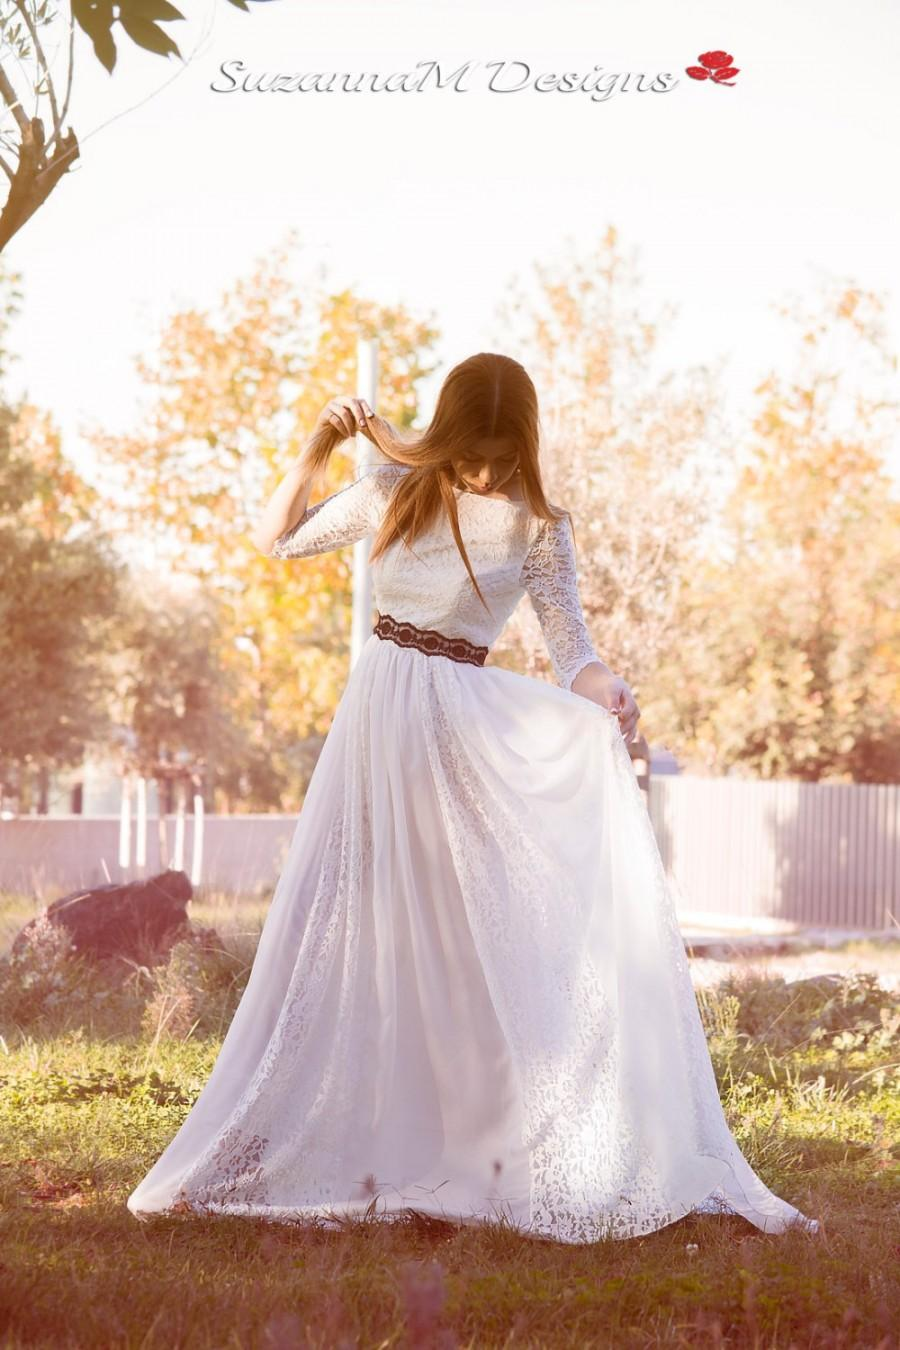 Hochzeit - Lace Wedding Dress, Ivory Wedding Gown,Bohemian Wedding Dress,Long Bridal Gown,long Sleeve Dress,Chiffon Wedding Dress by SuzannaM Designs